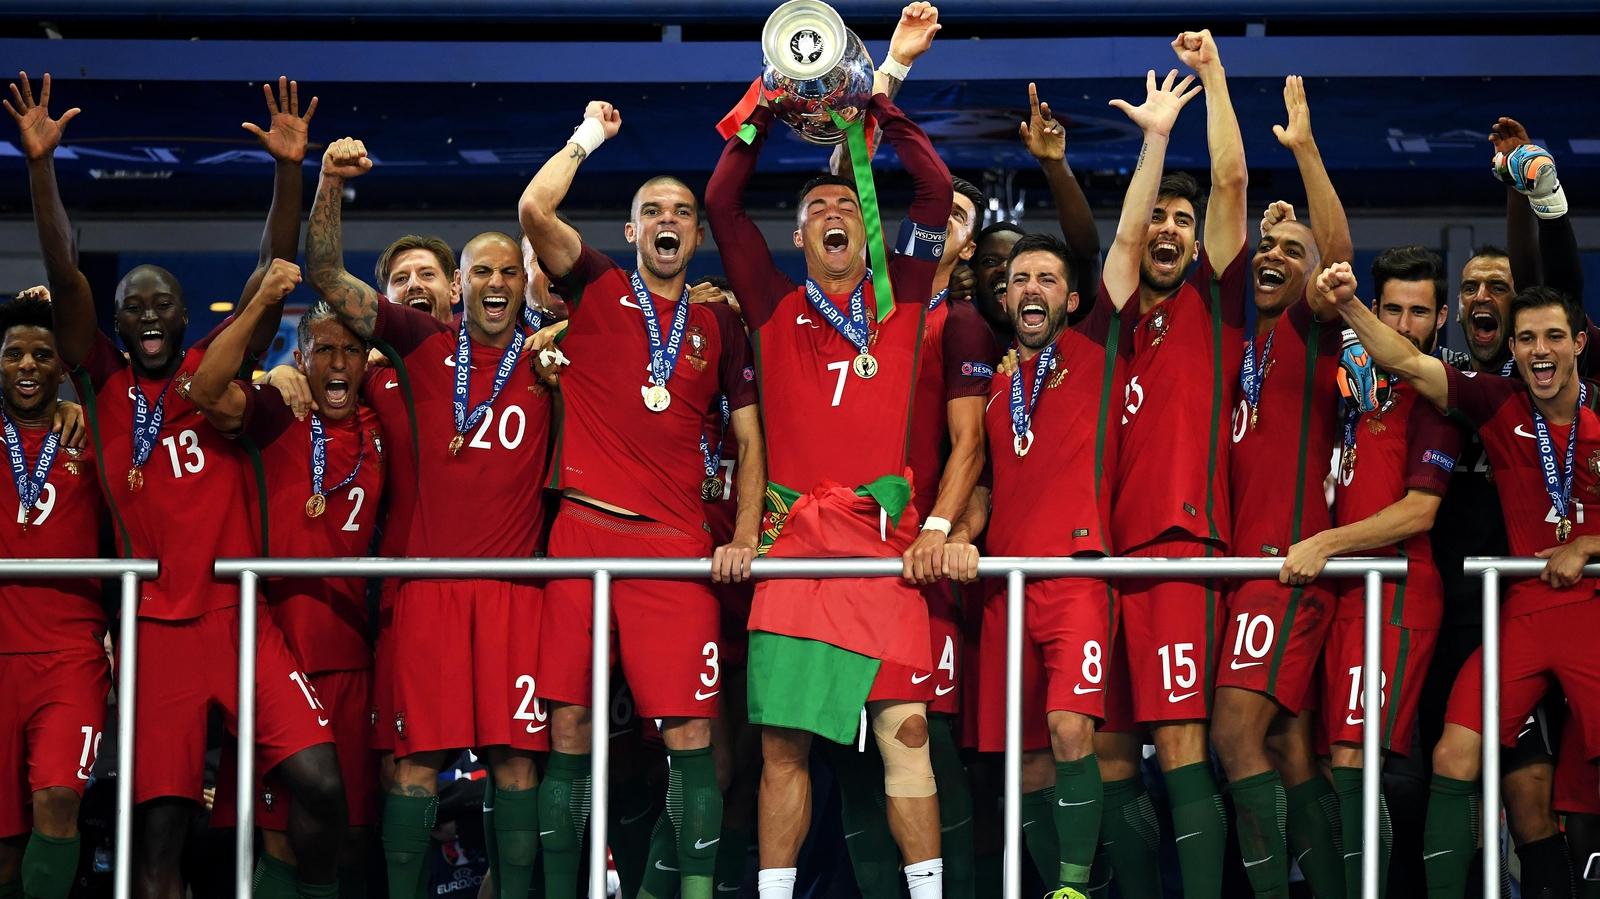 portugal euro 2016-ის სურათის შედეგი